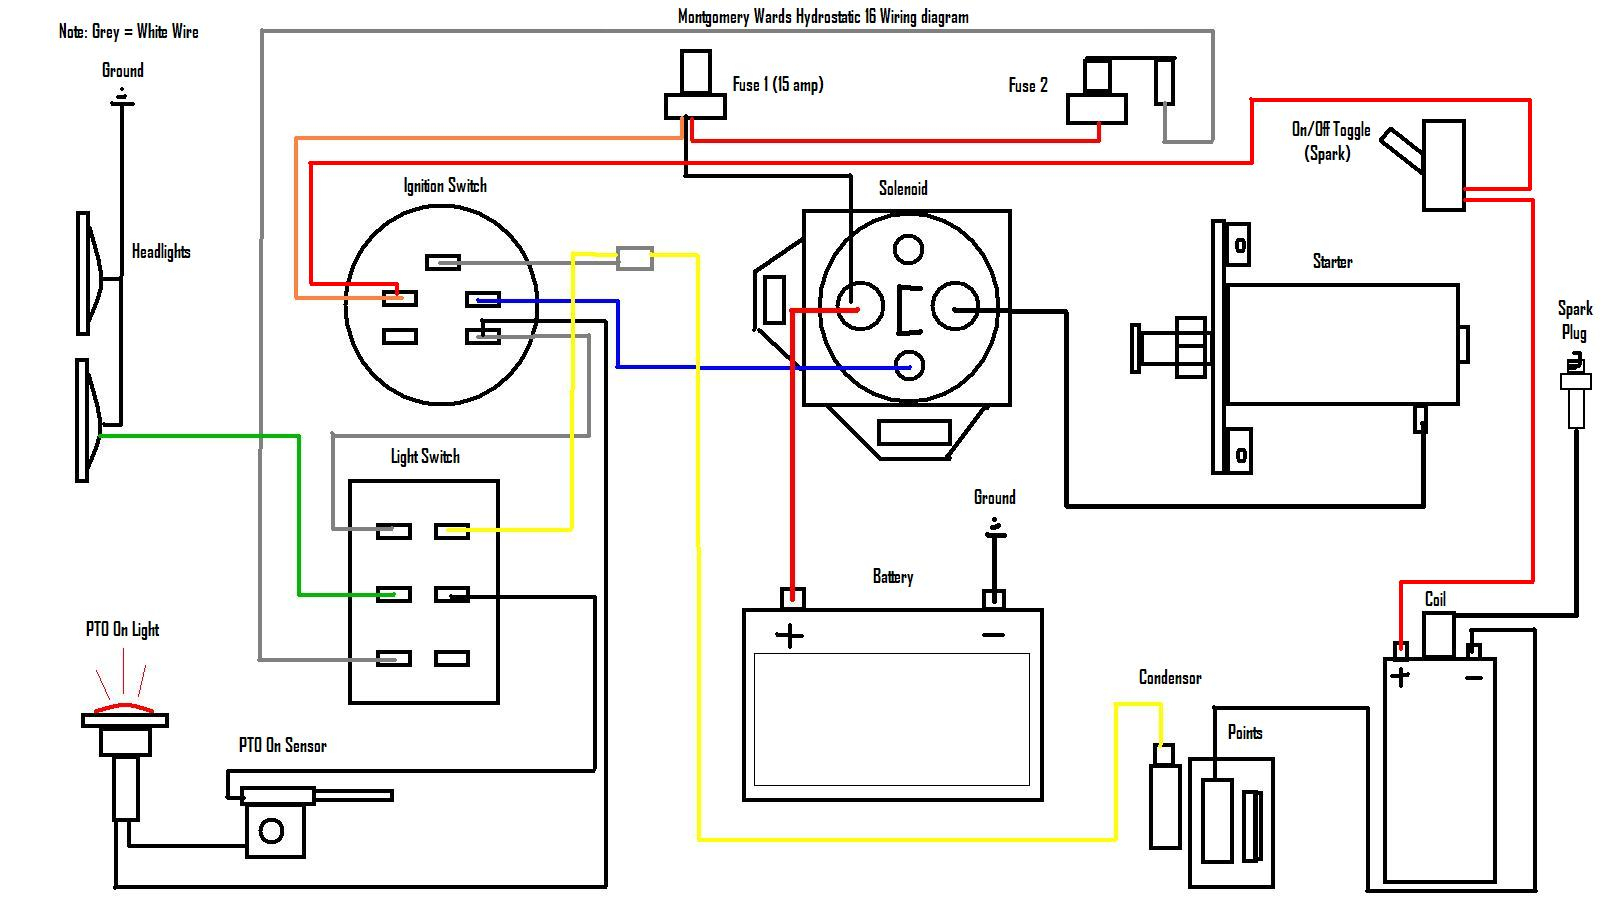 Briggs And Stratton 17 Hp Wiring Diagram | Best Wiring Library - Briggs And Stratton Coil Wiring Diagram